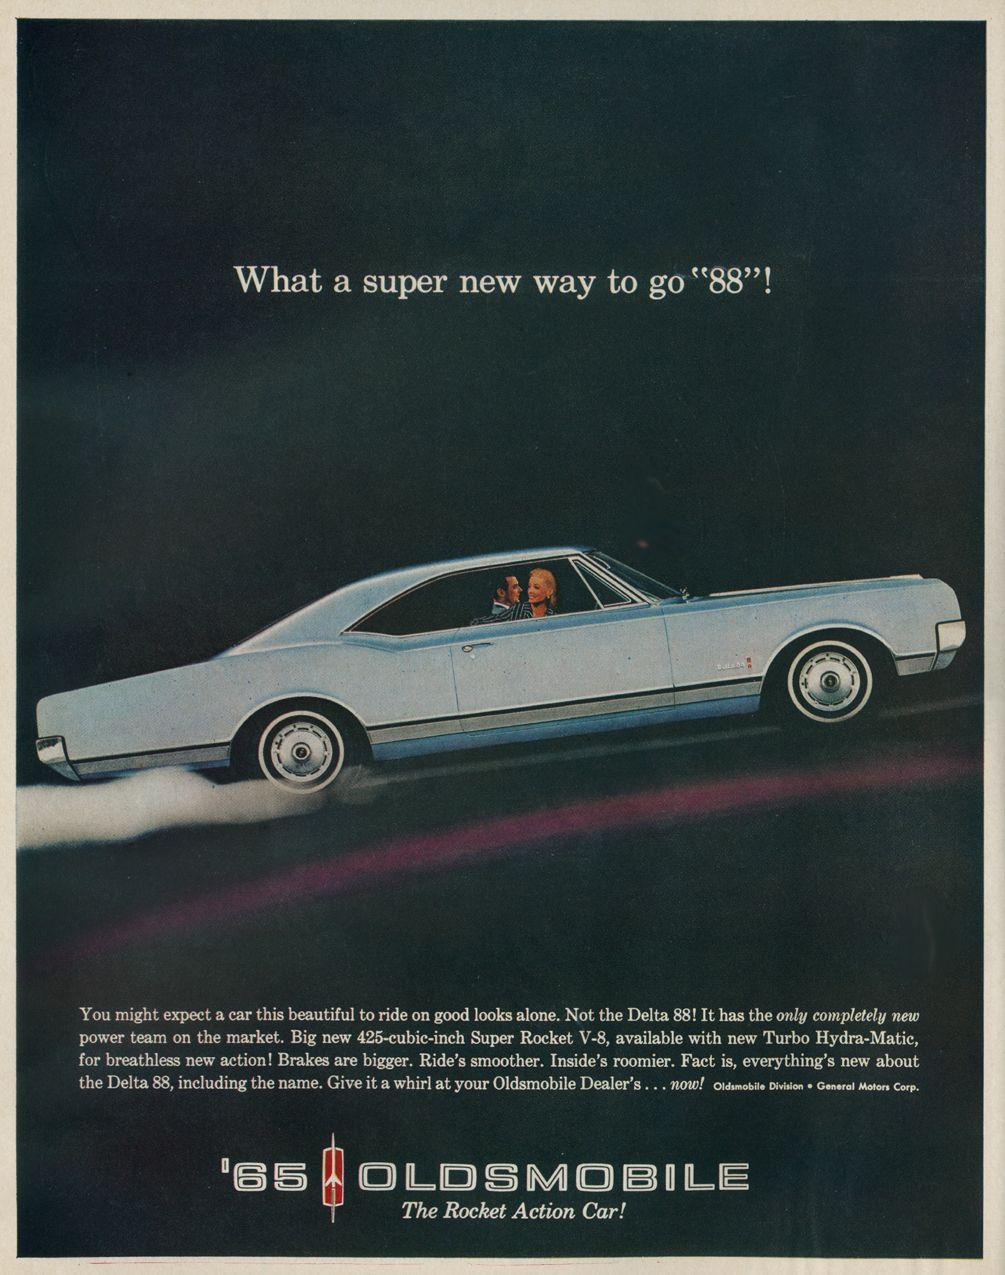 medium resolution of 1965 oldsmobile car advert